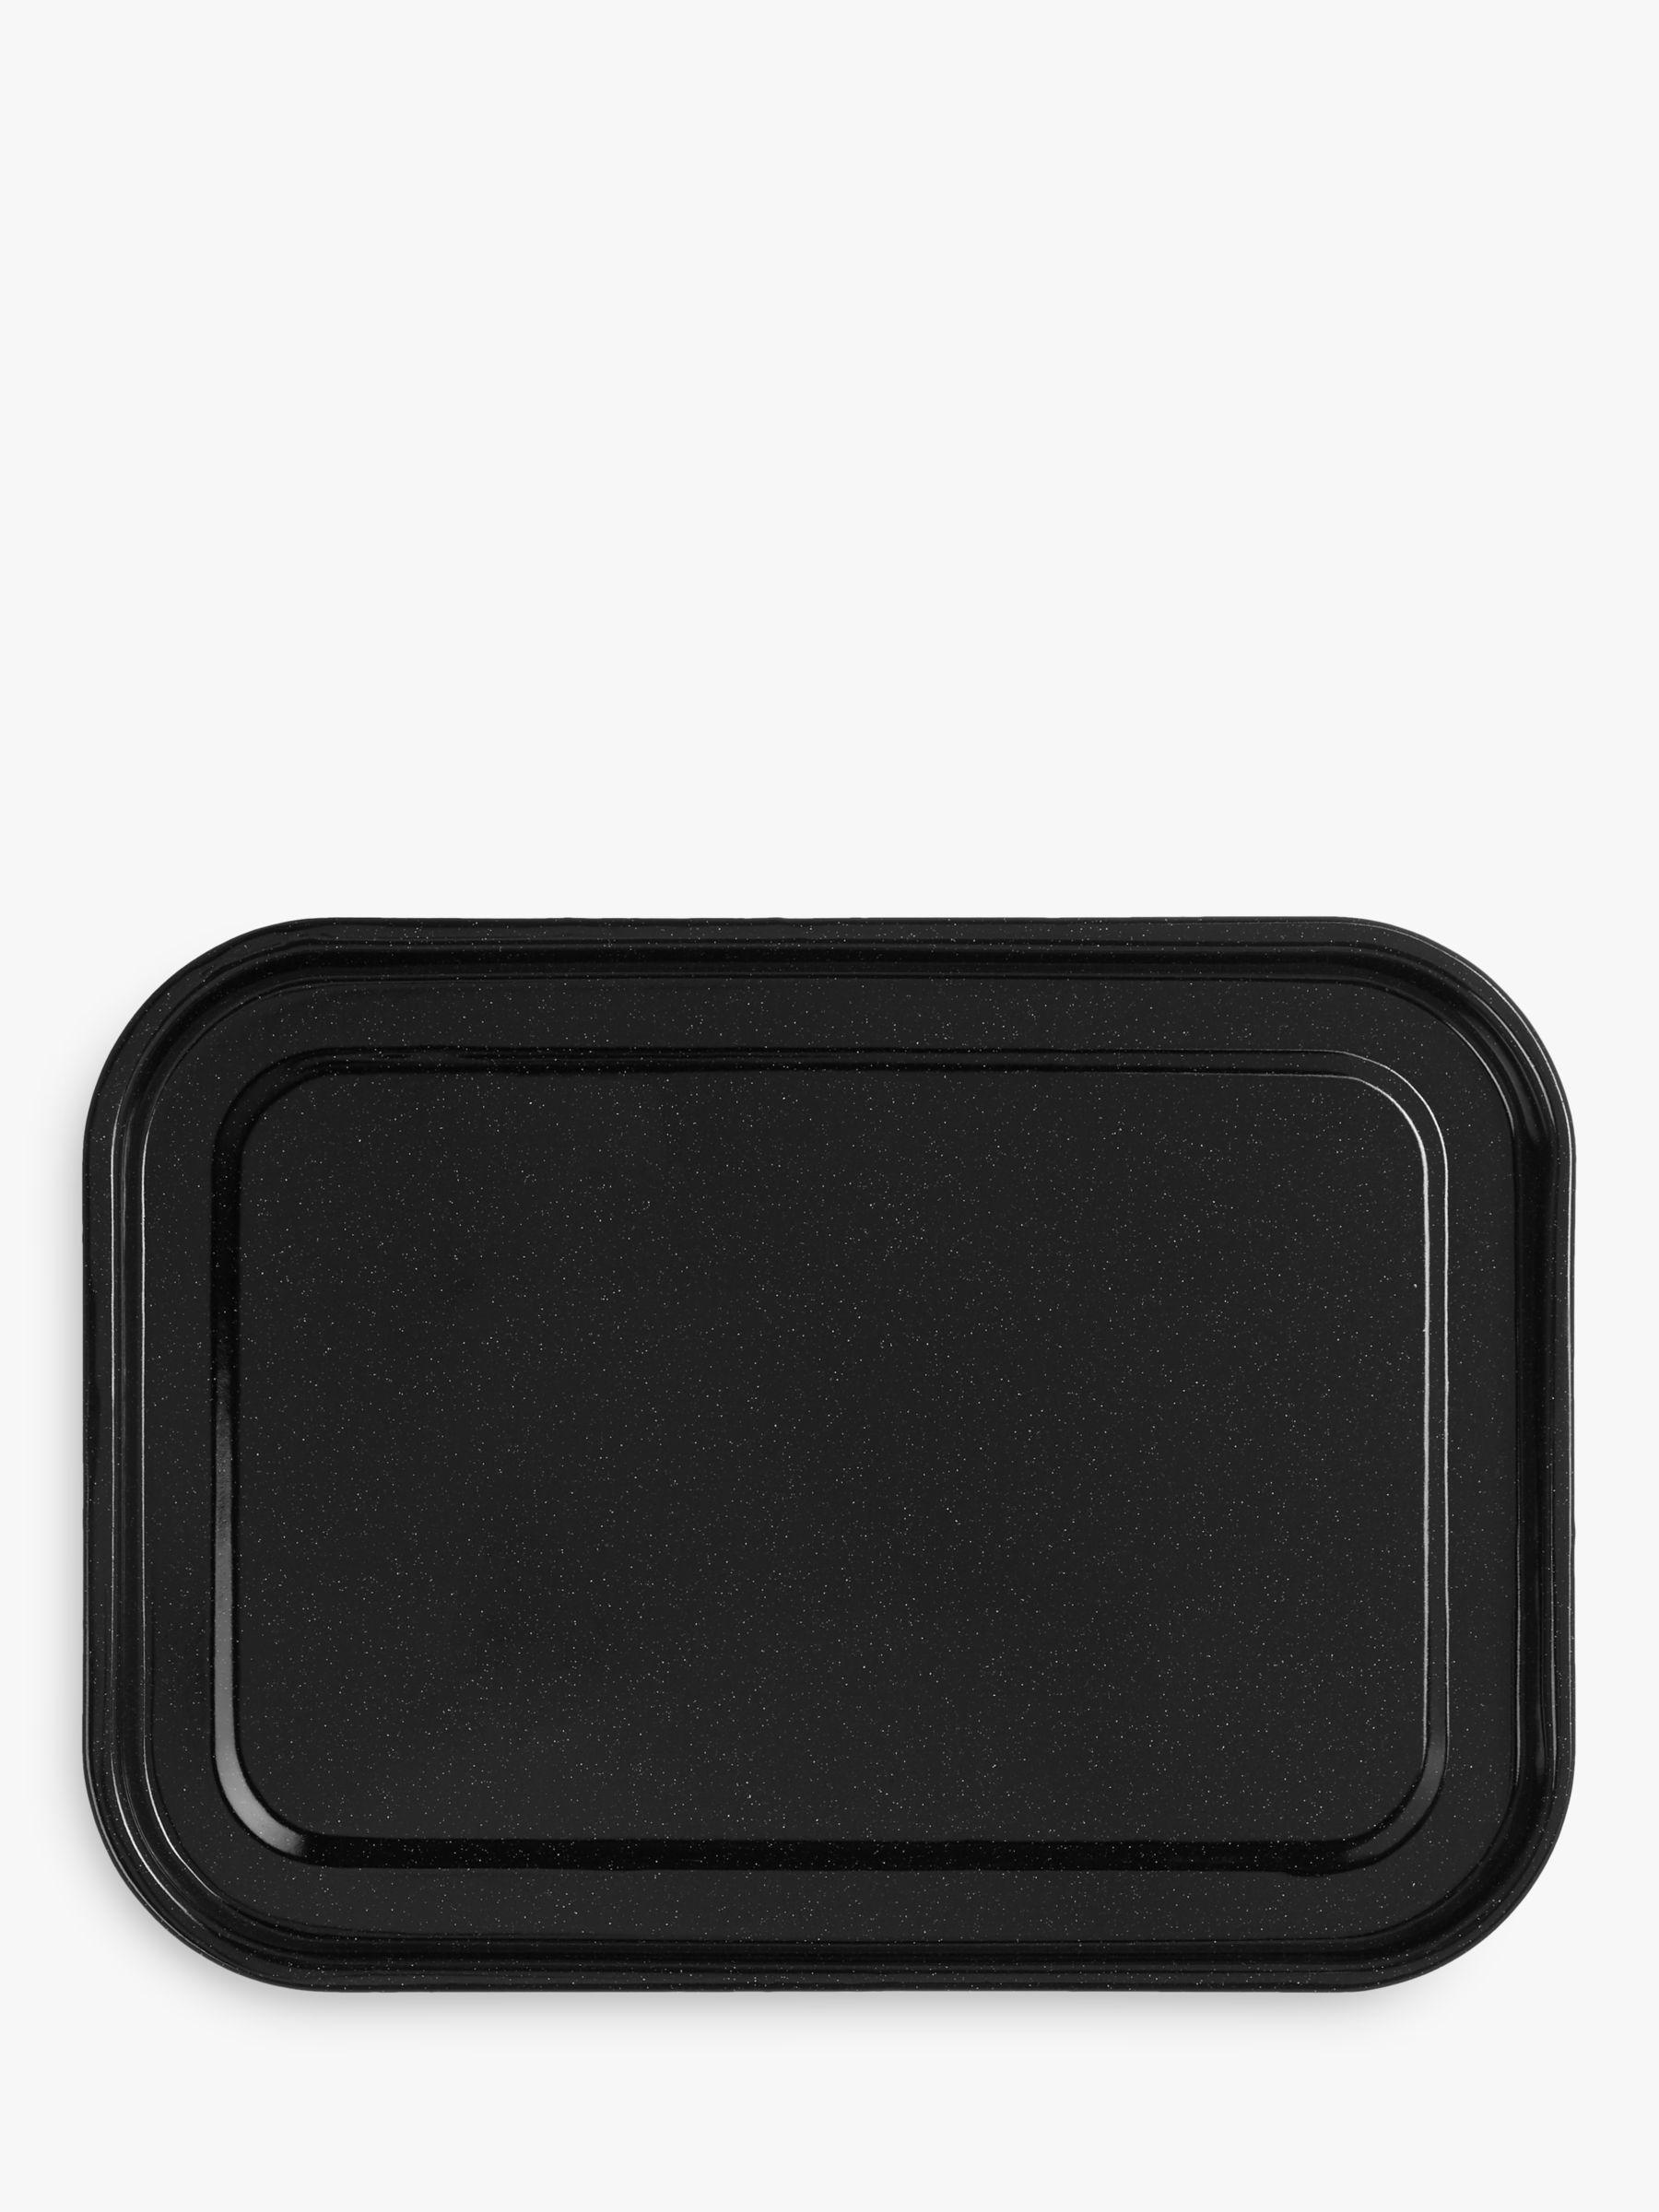 John Lewis & Partners Vitreous Enamel Non-Stick Oven Tray, L40 x W28cm